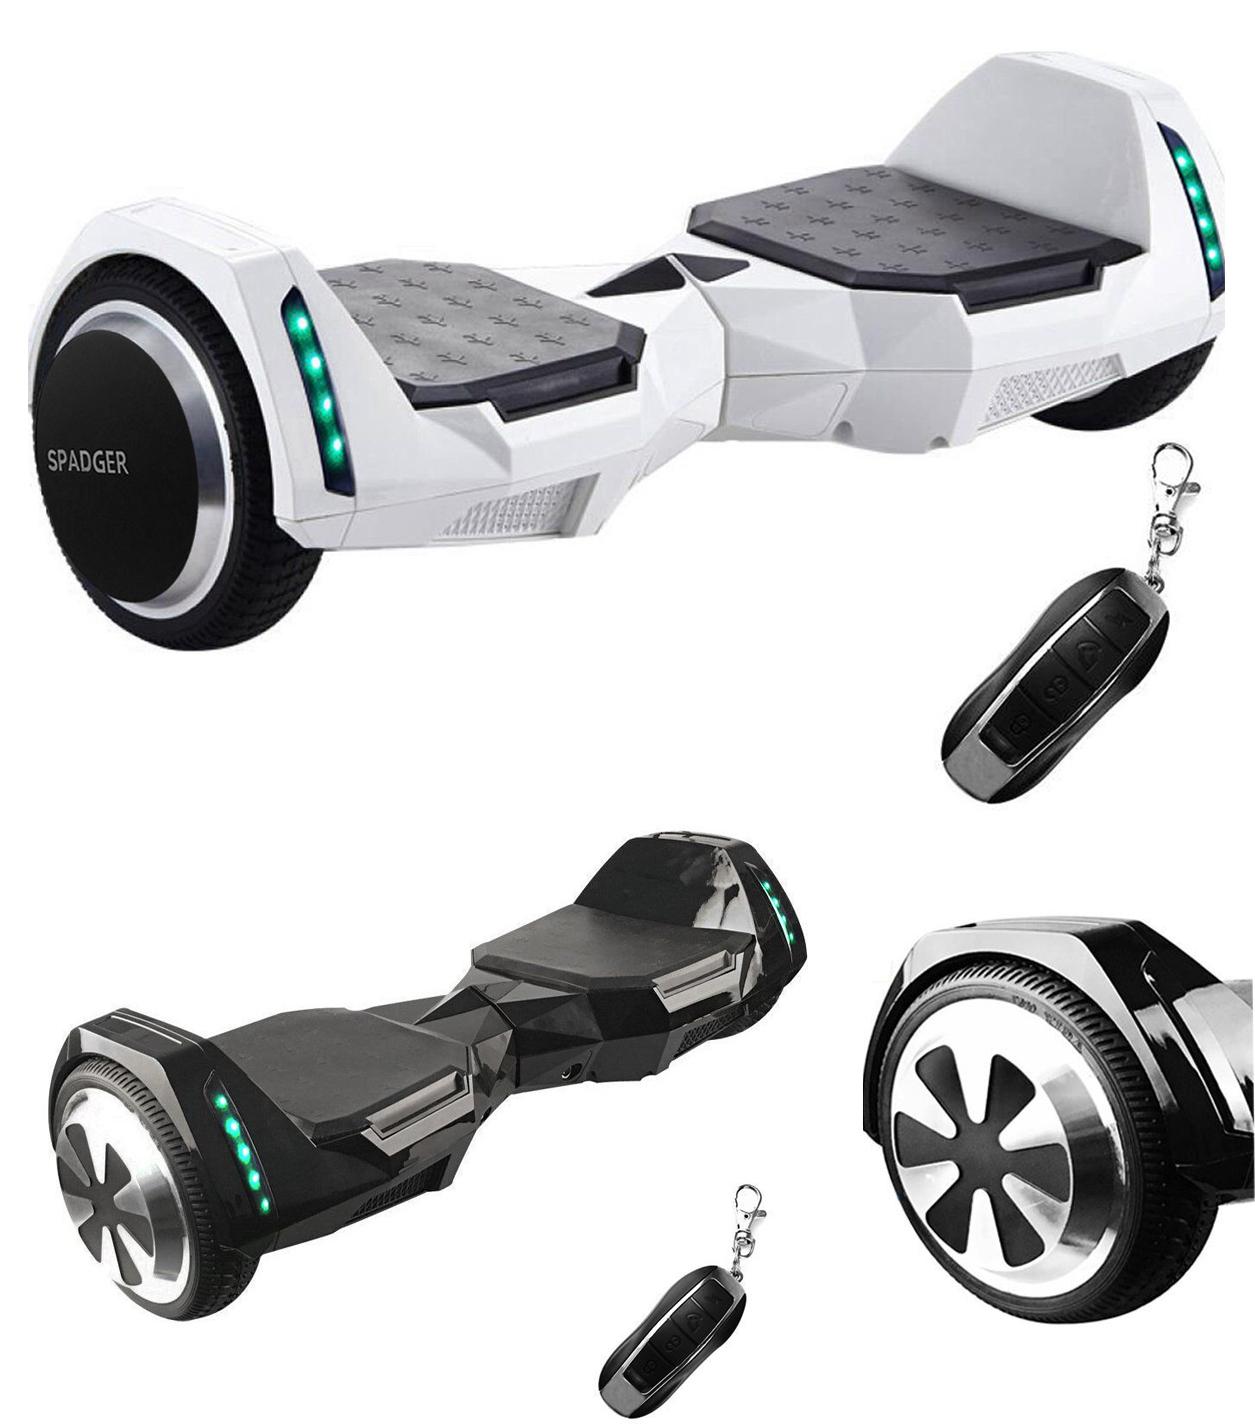 spadger self balancing scooter ul2272 certified electric. Black Bedroom Furniture Sets. Home Design Ideas